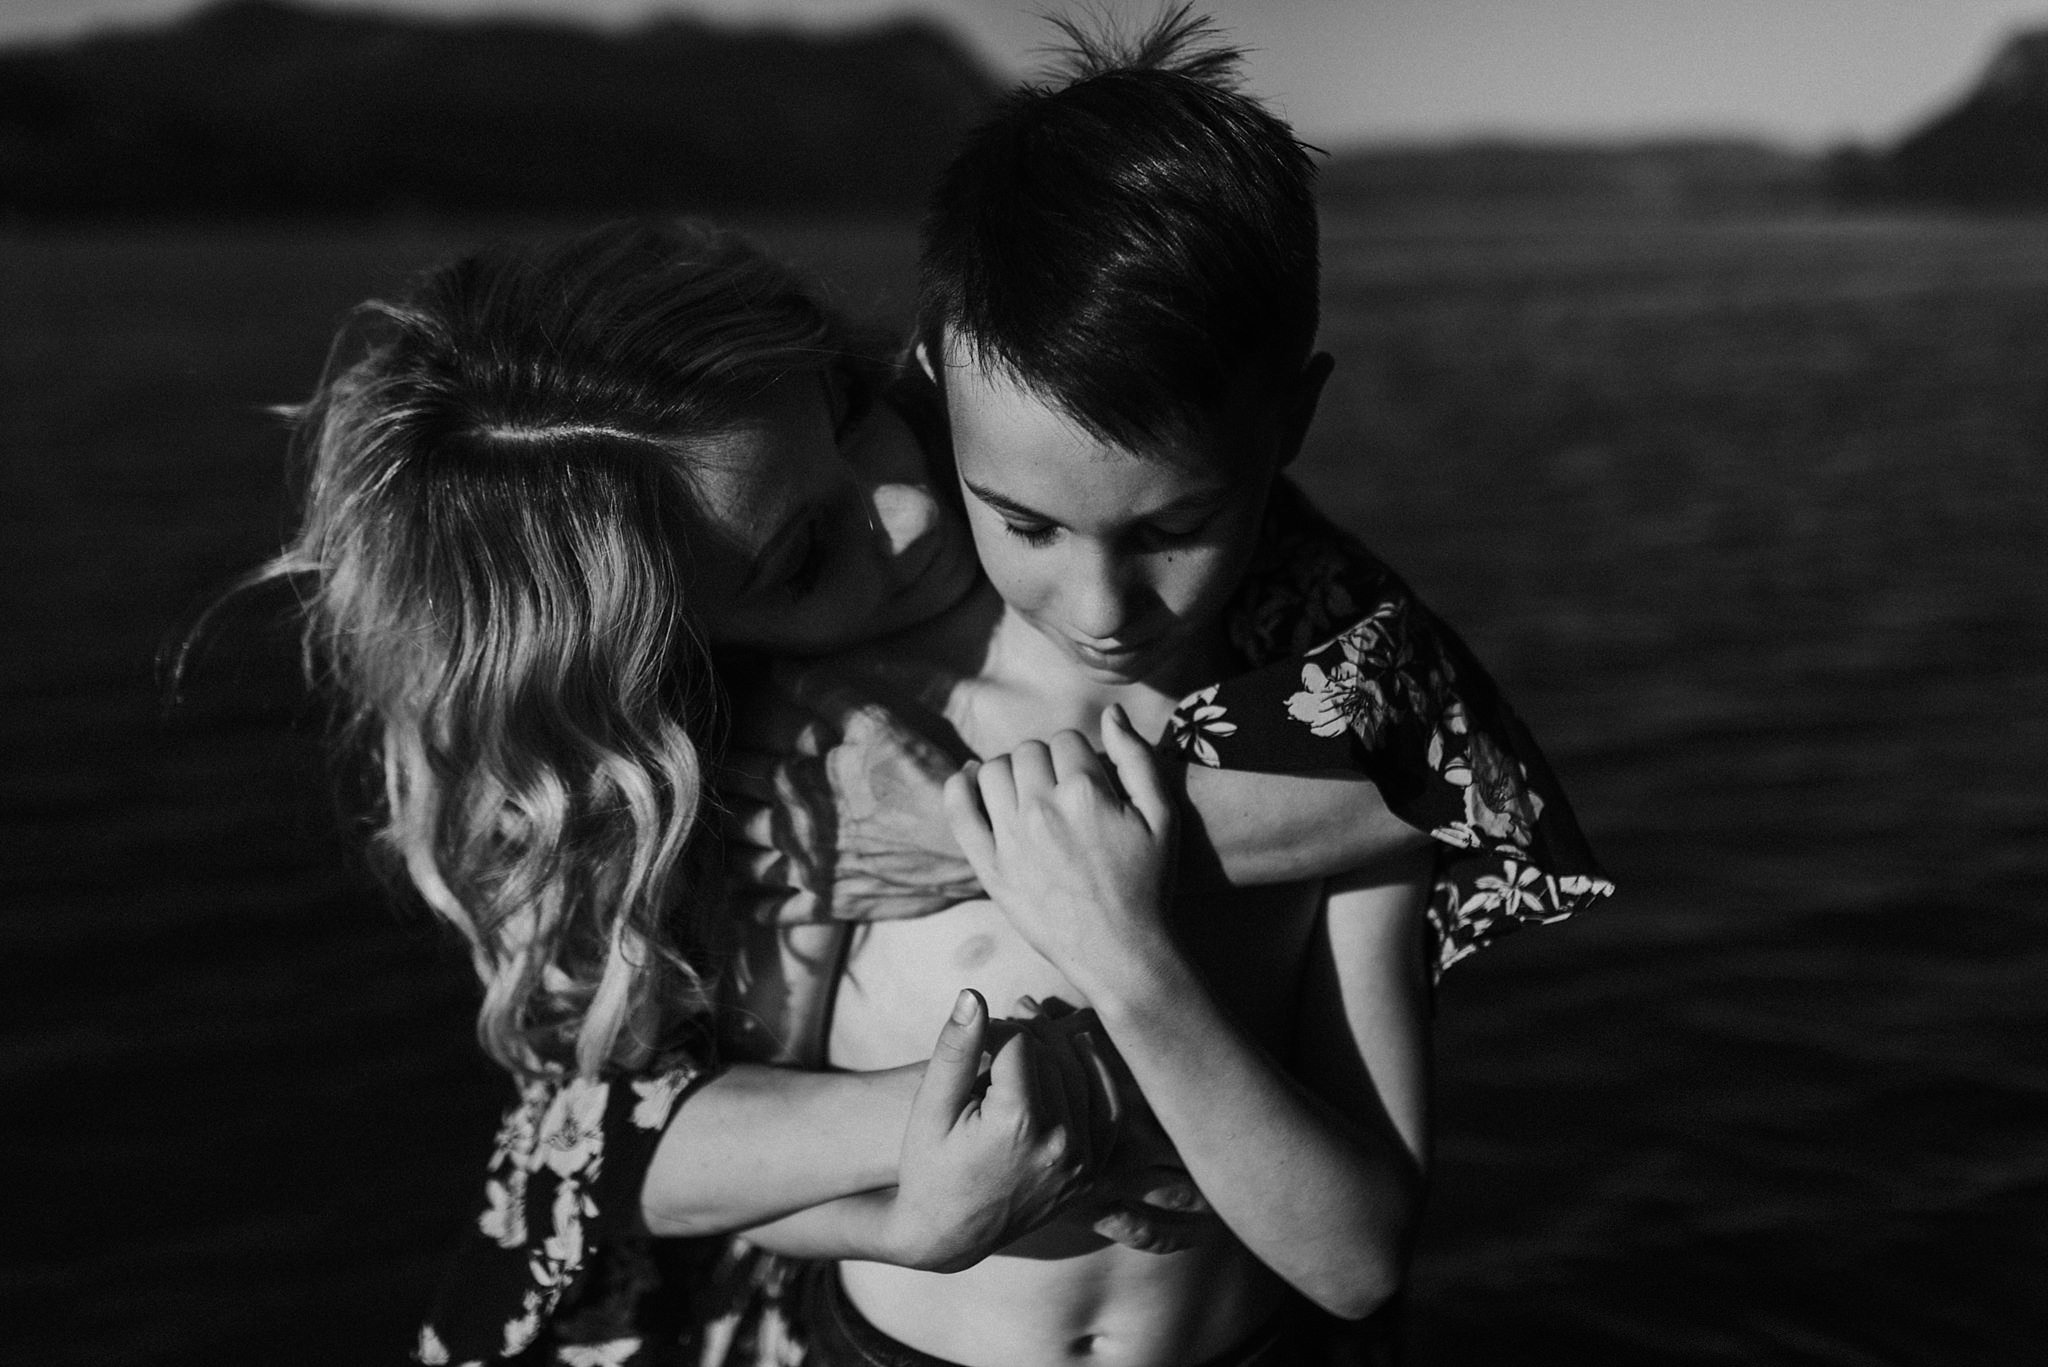 twyla jones photography - treasure coast florida - intimate couples session urban cowboy b&b | brooklyn New York_0073.jpg